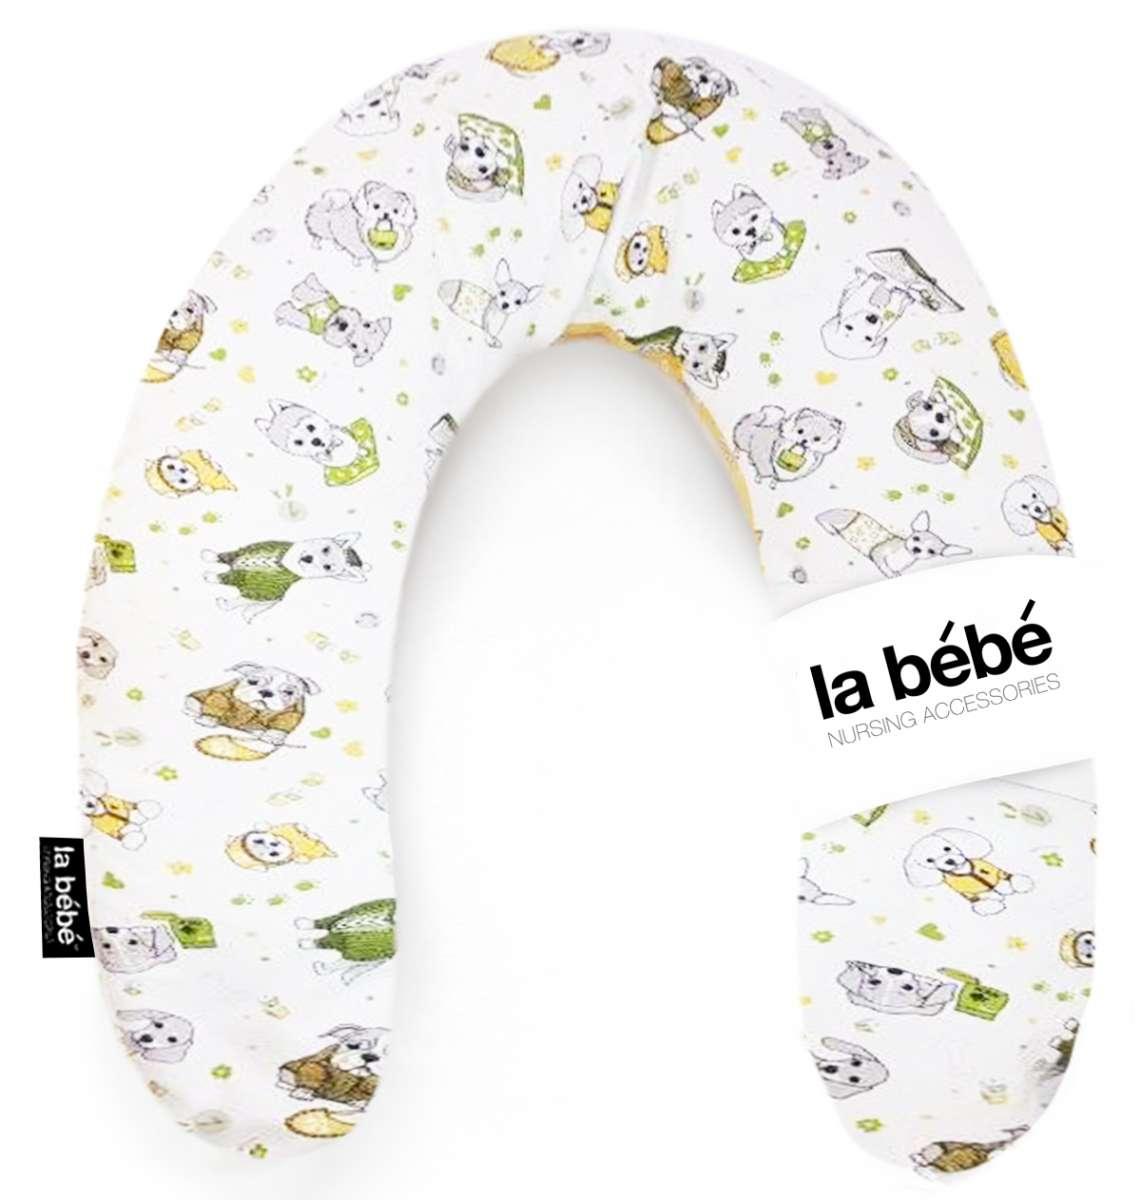 La Bebe Snug Cotton Nursing Maternity Pillow Funny Dogs Pakaviņš mazuļa barošanai, gulēšanai